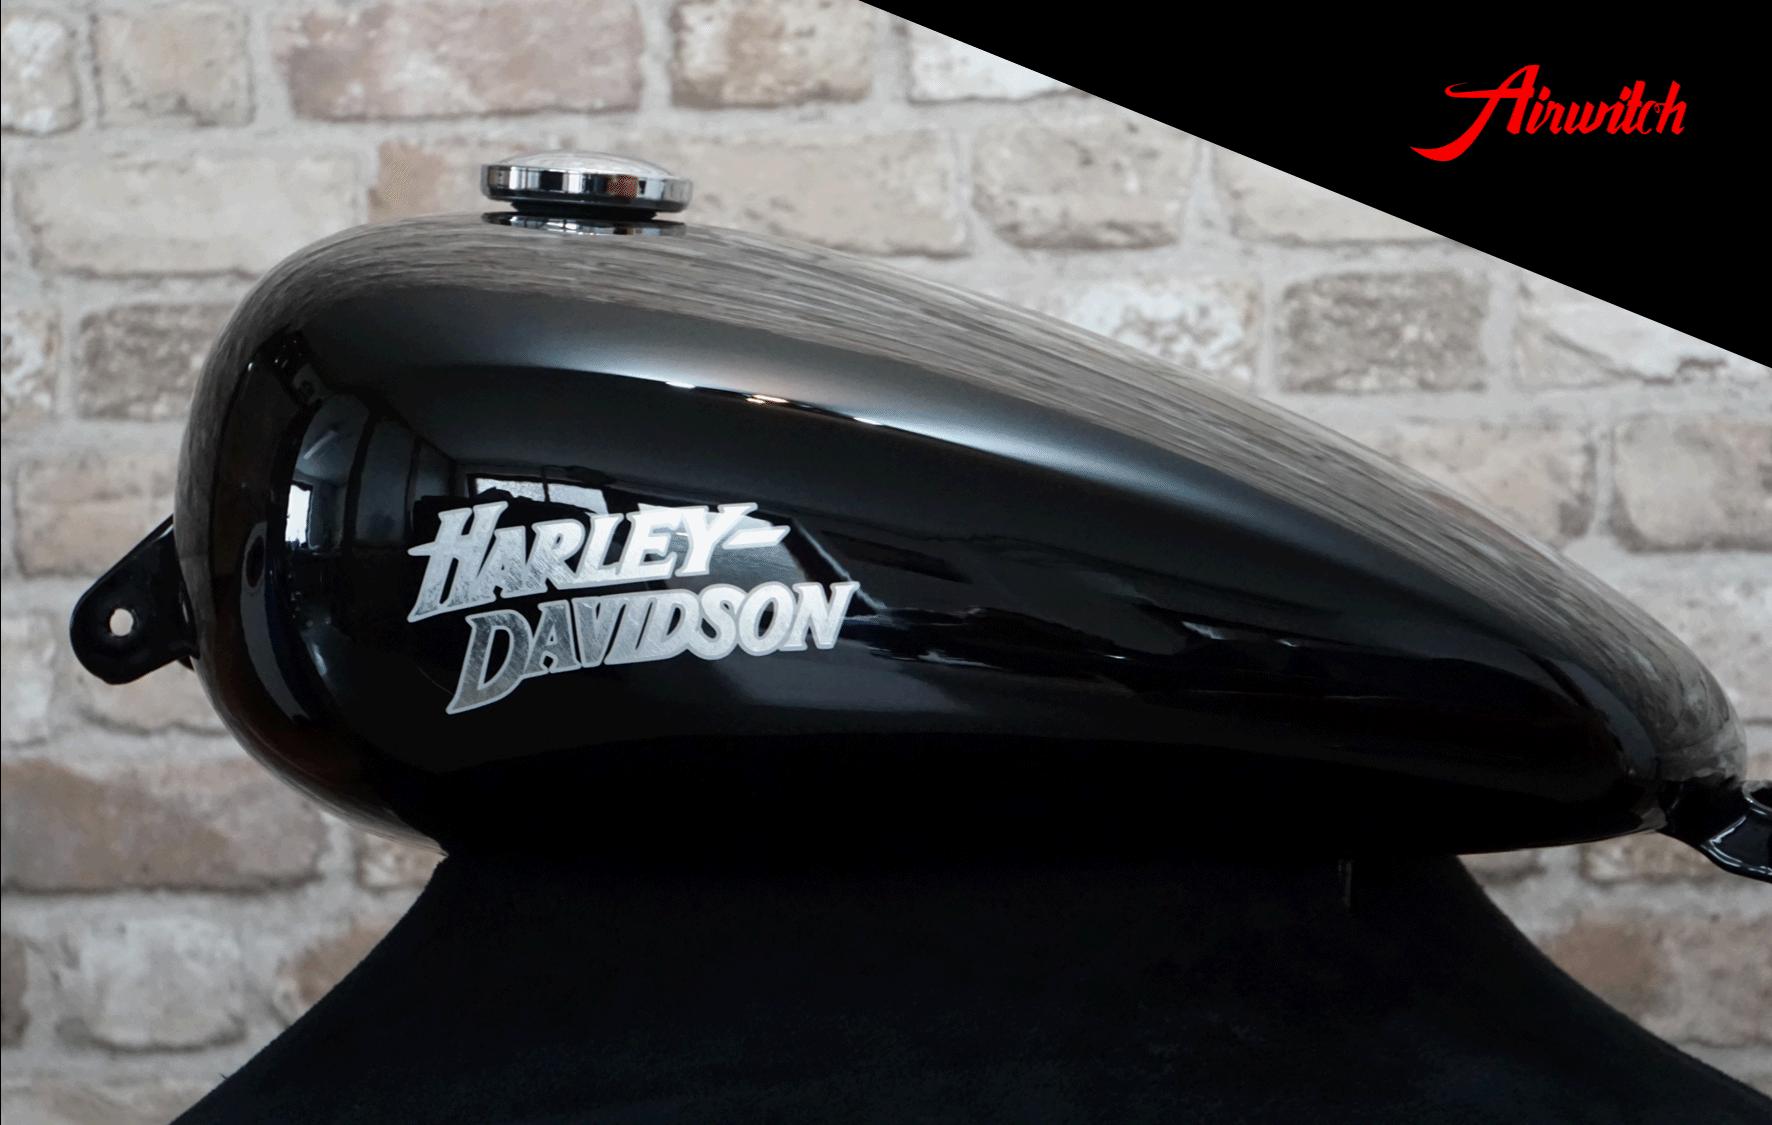 Custom Paint Harley Davidson Sportster Lackierung Timeless in Black & Silverleaf